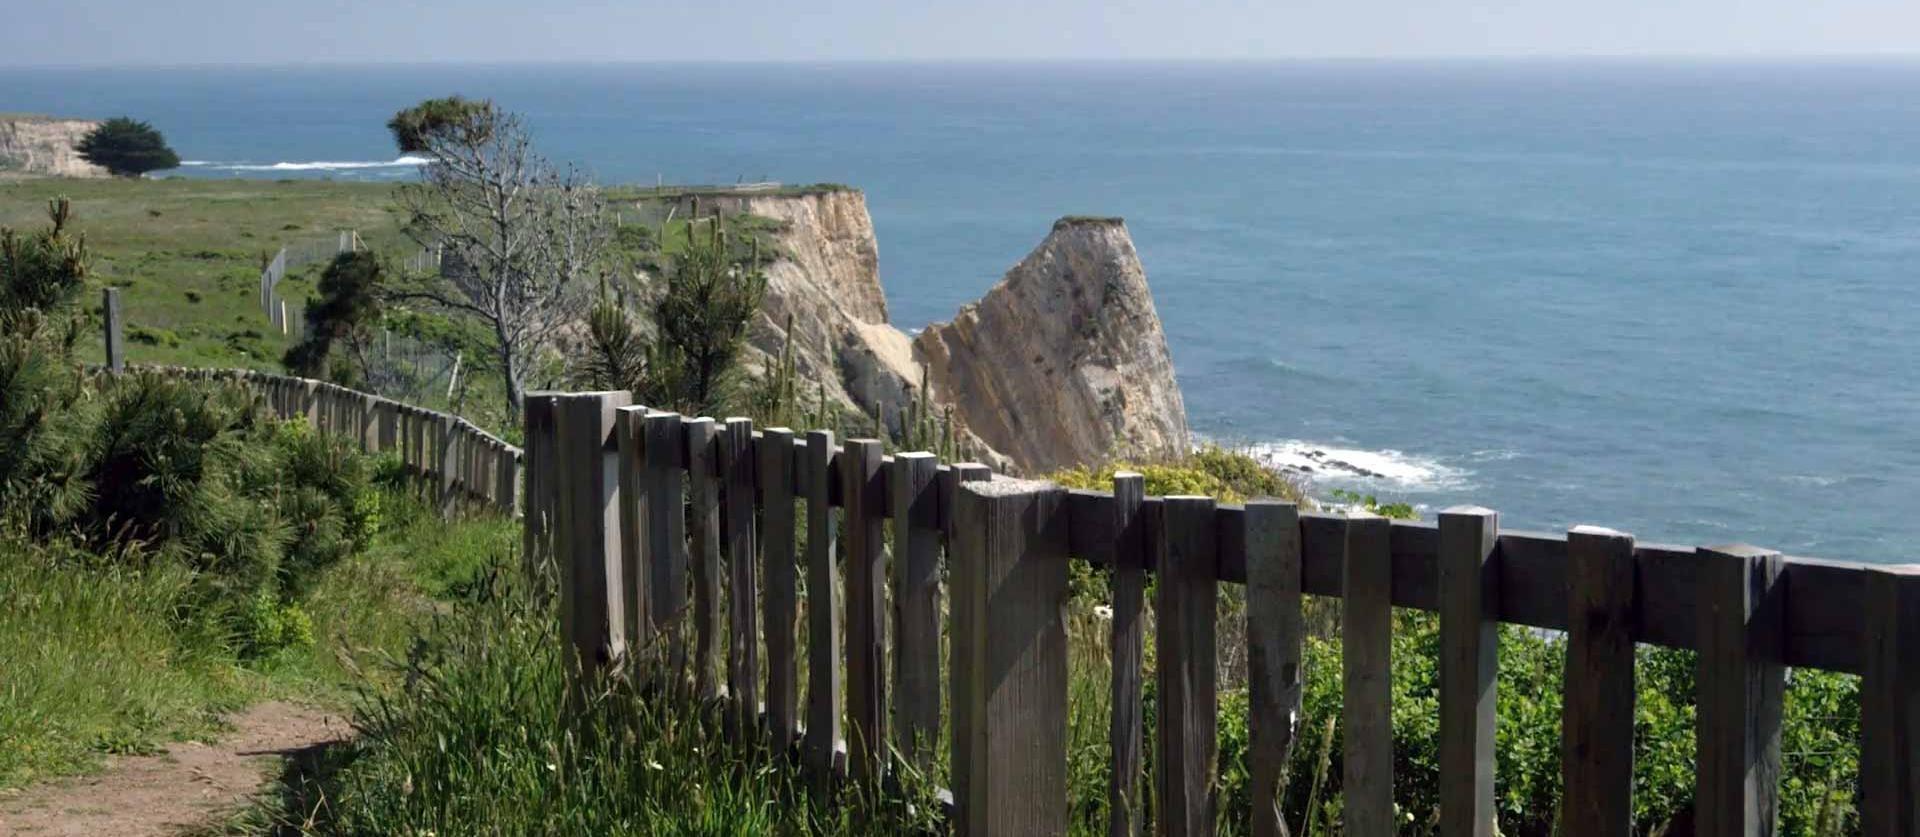 GoAltaCA Pelican Bluffs and The Art of Trail Design